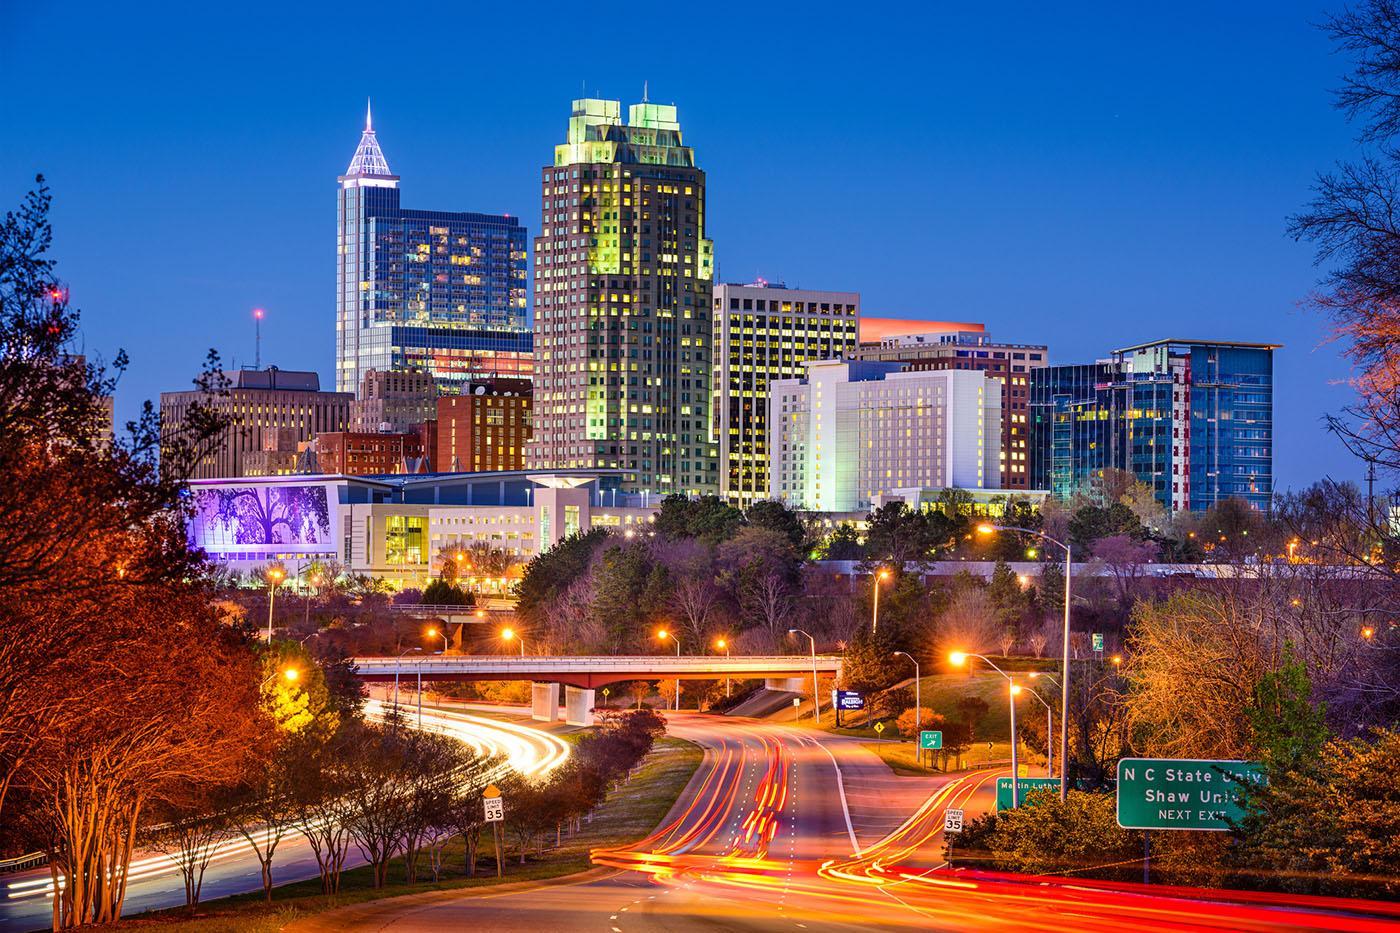 Law Firm In Raleigh North Carolina Poyner Spruill Llp